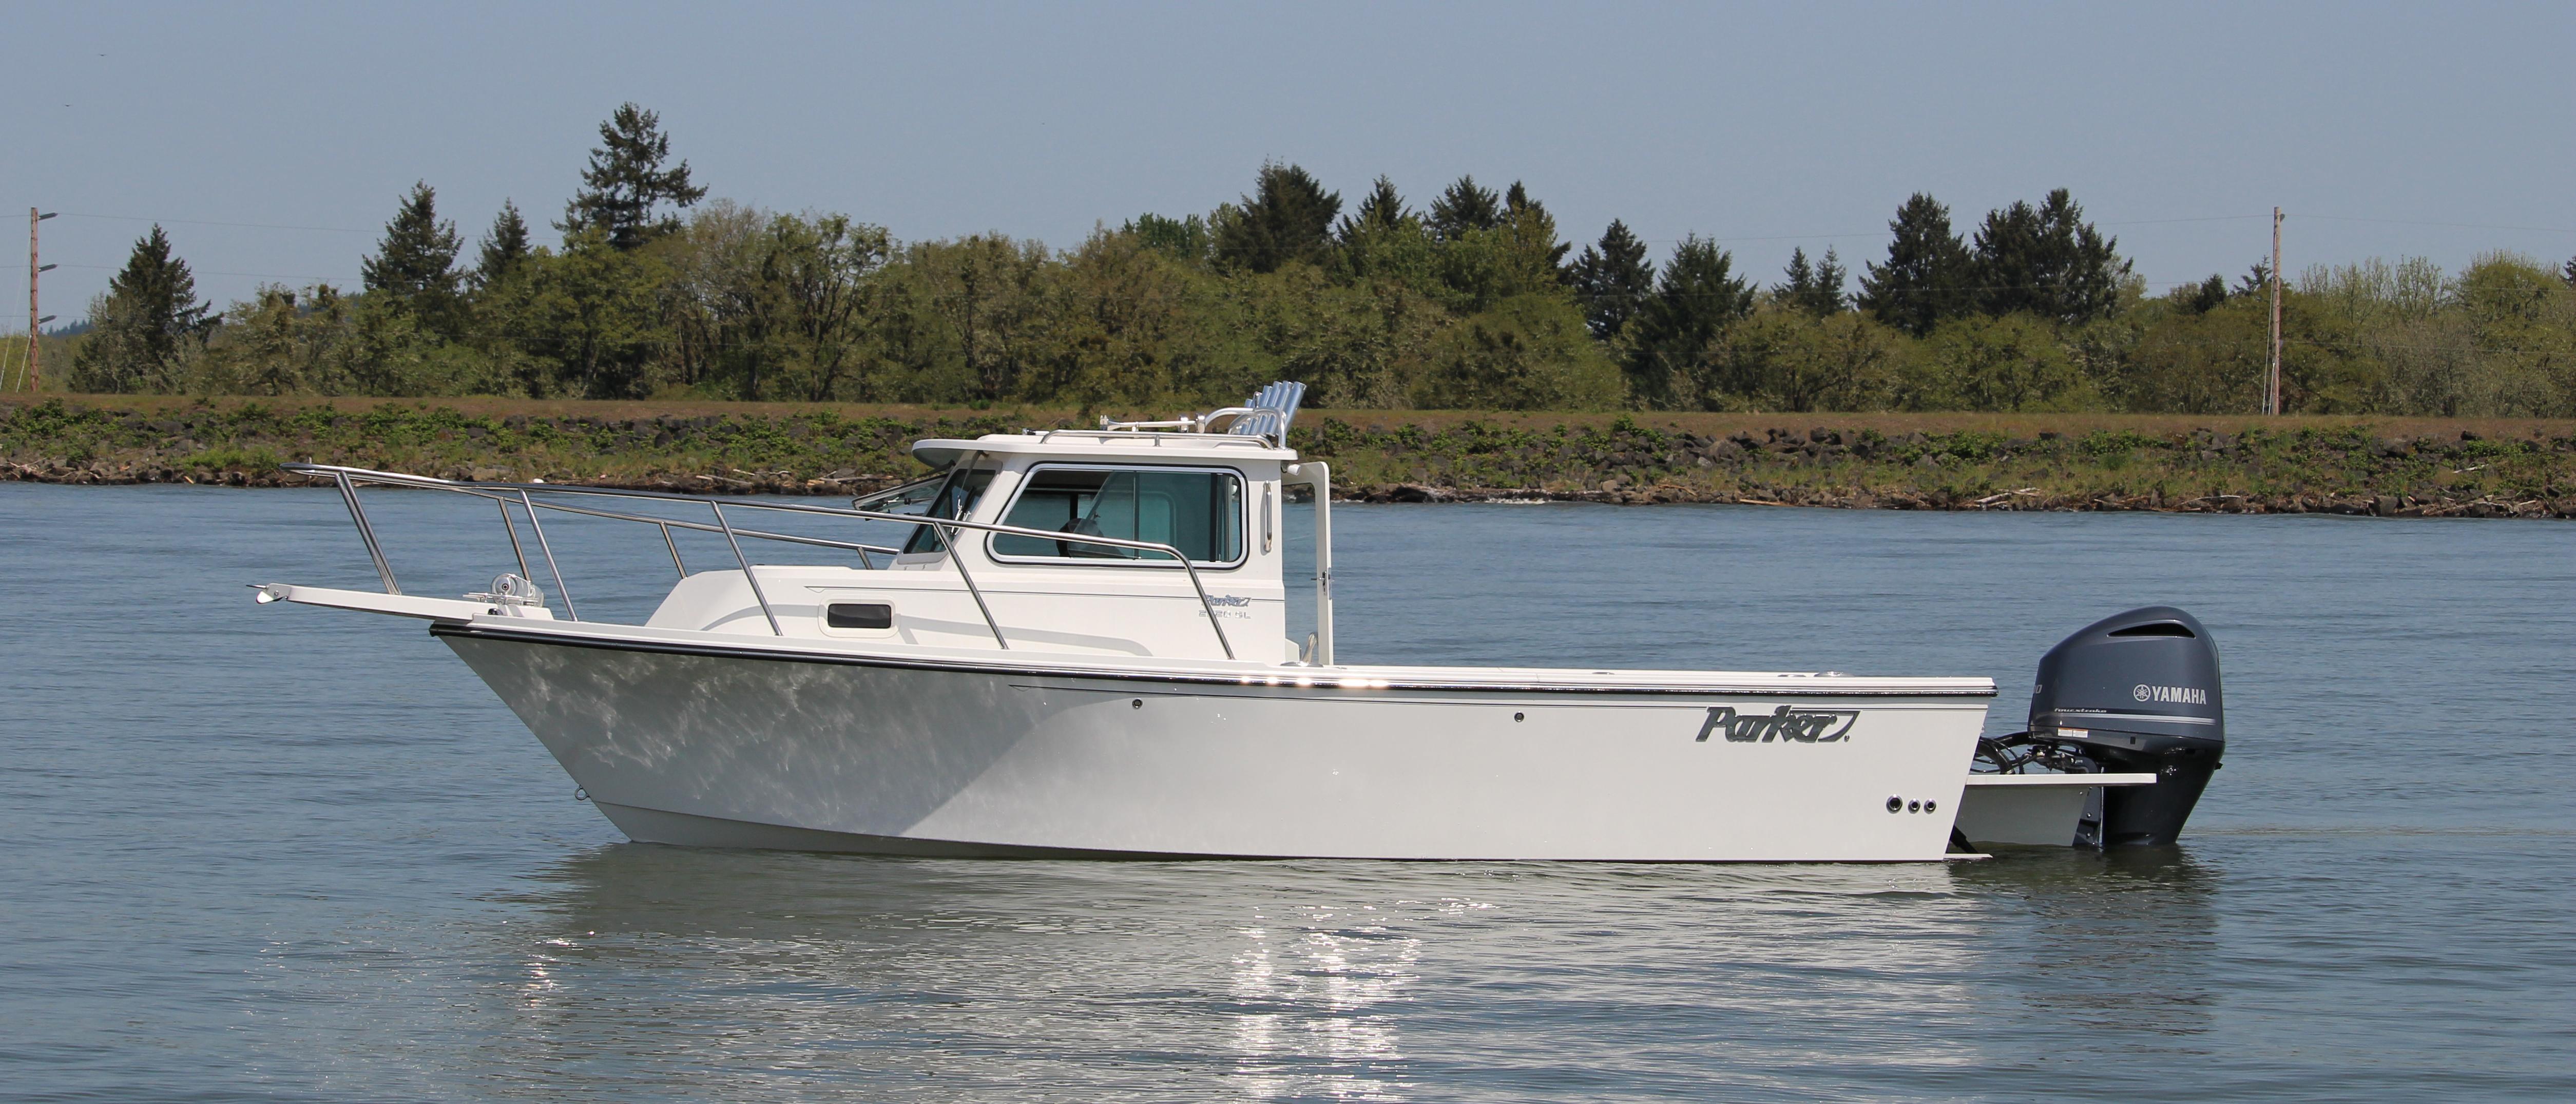 Maxxum Marine - Thunder Jet, Boulton, Fish Rite, Parker